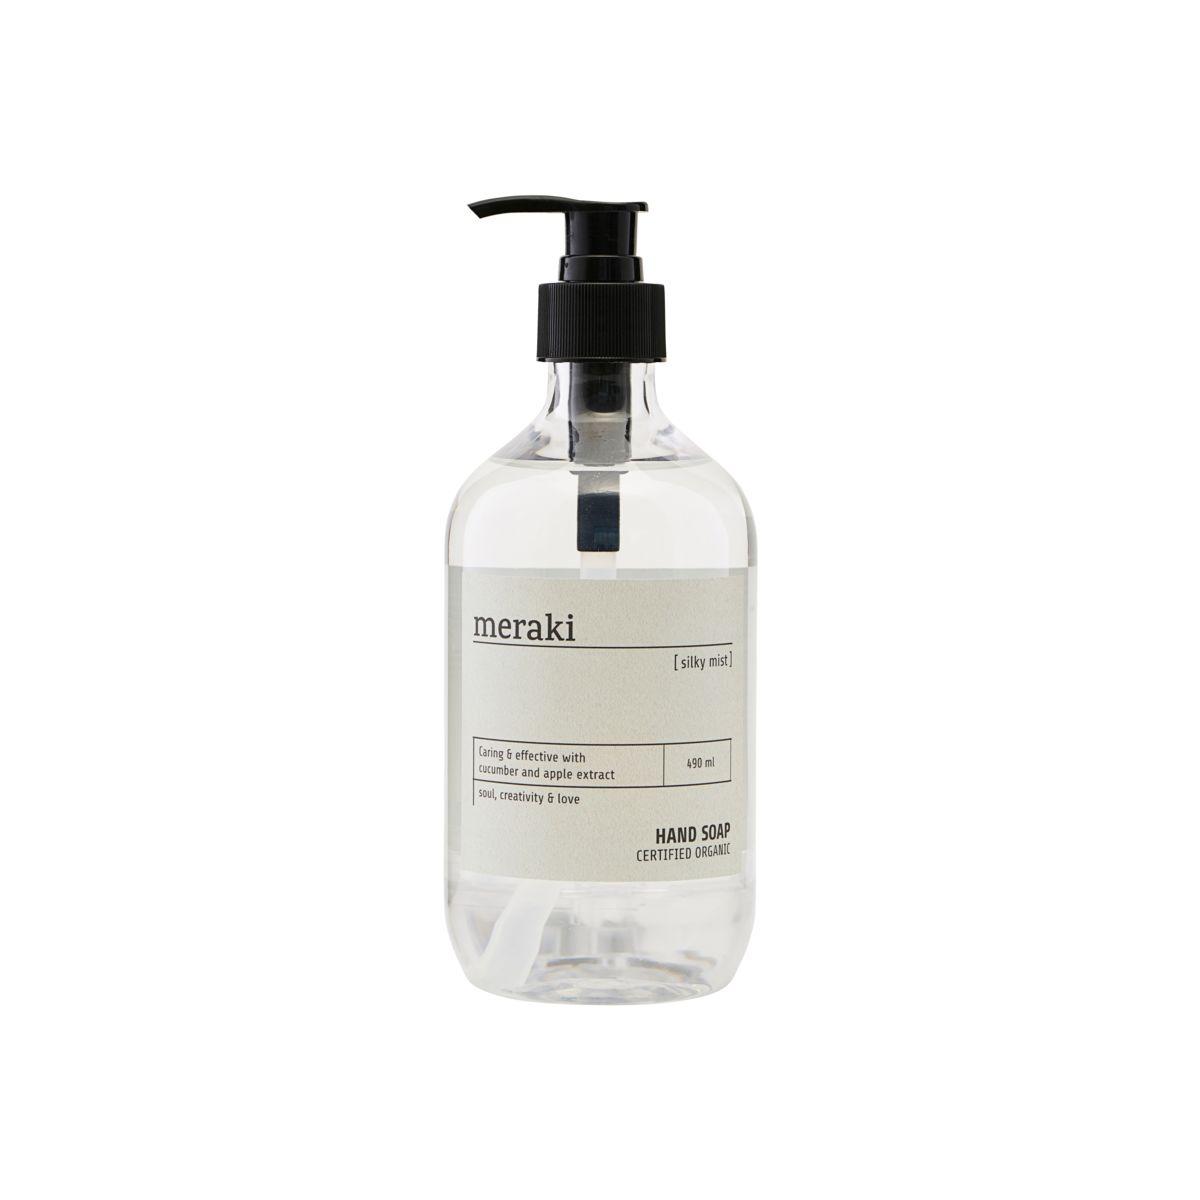 Meraki Silky Mist Hand Soap, 490 ml